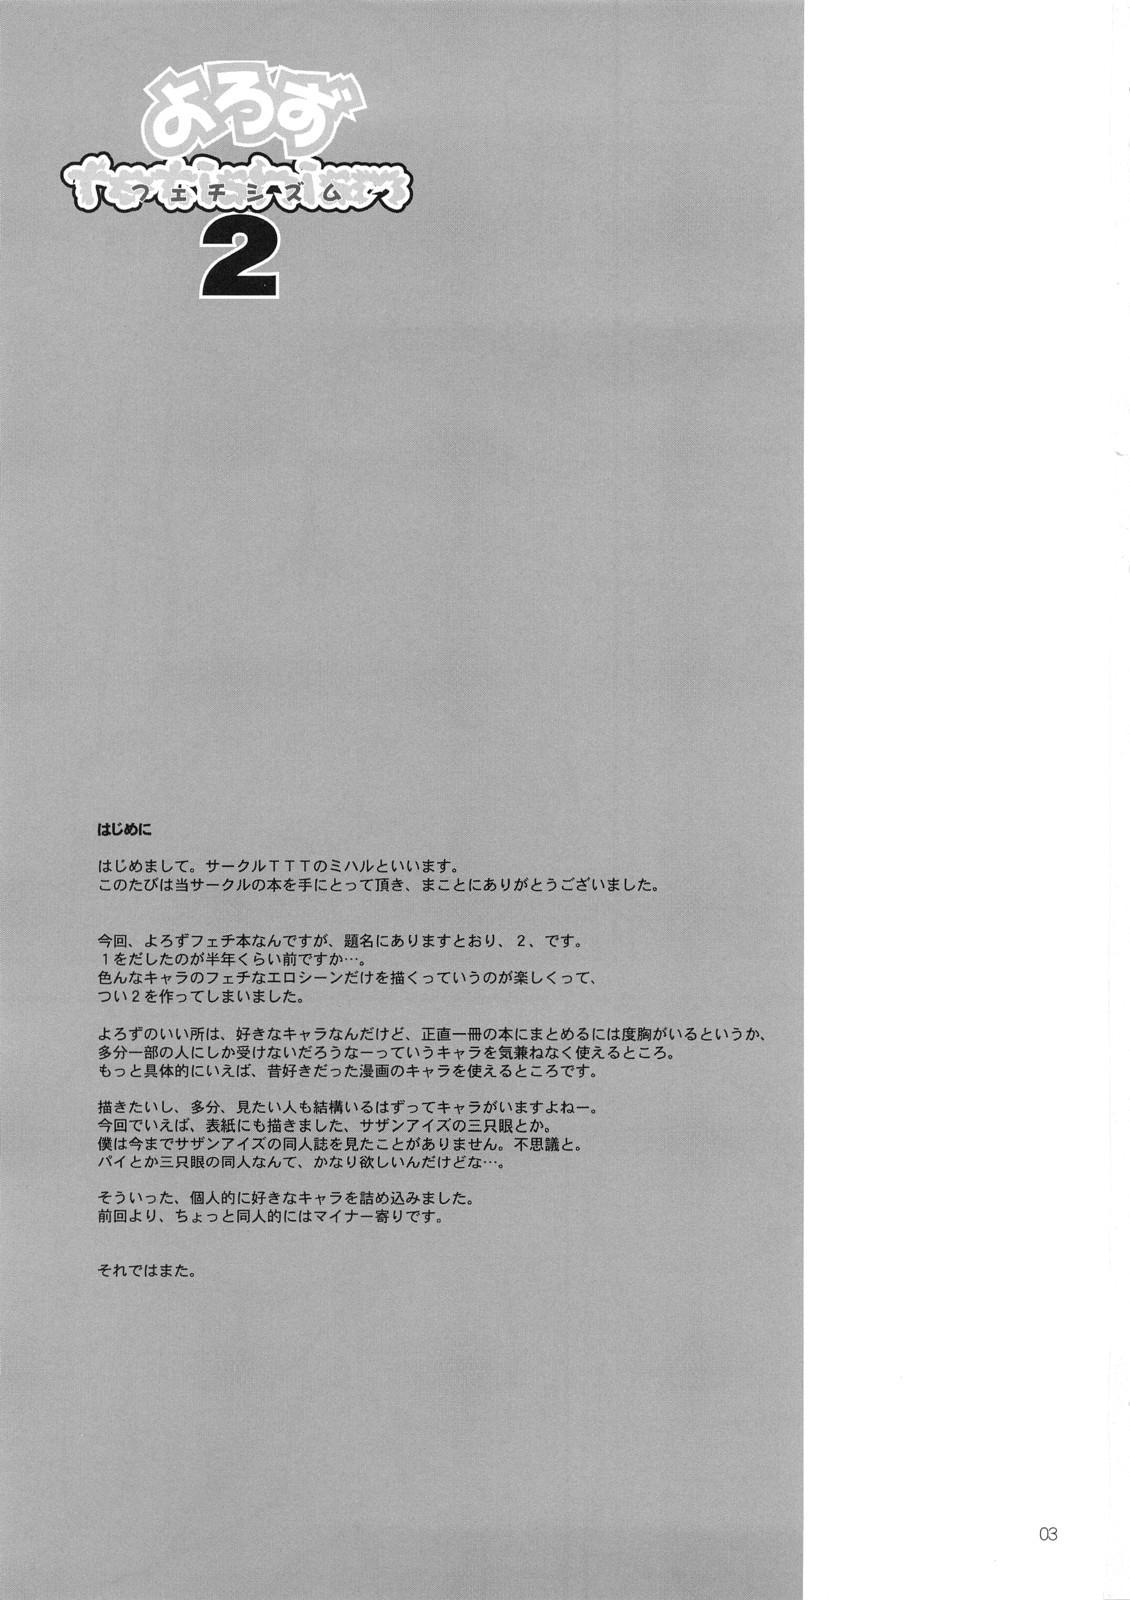 Yorozu fetishism 2 1